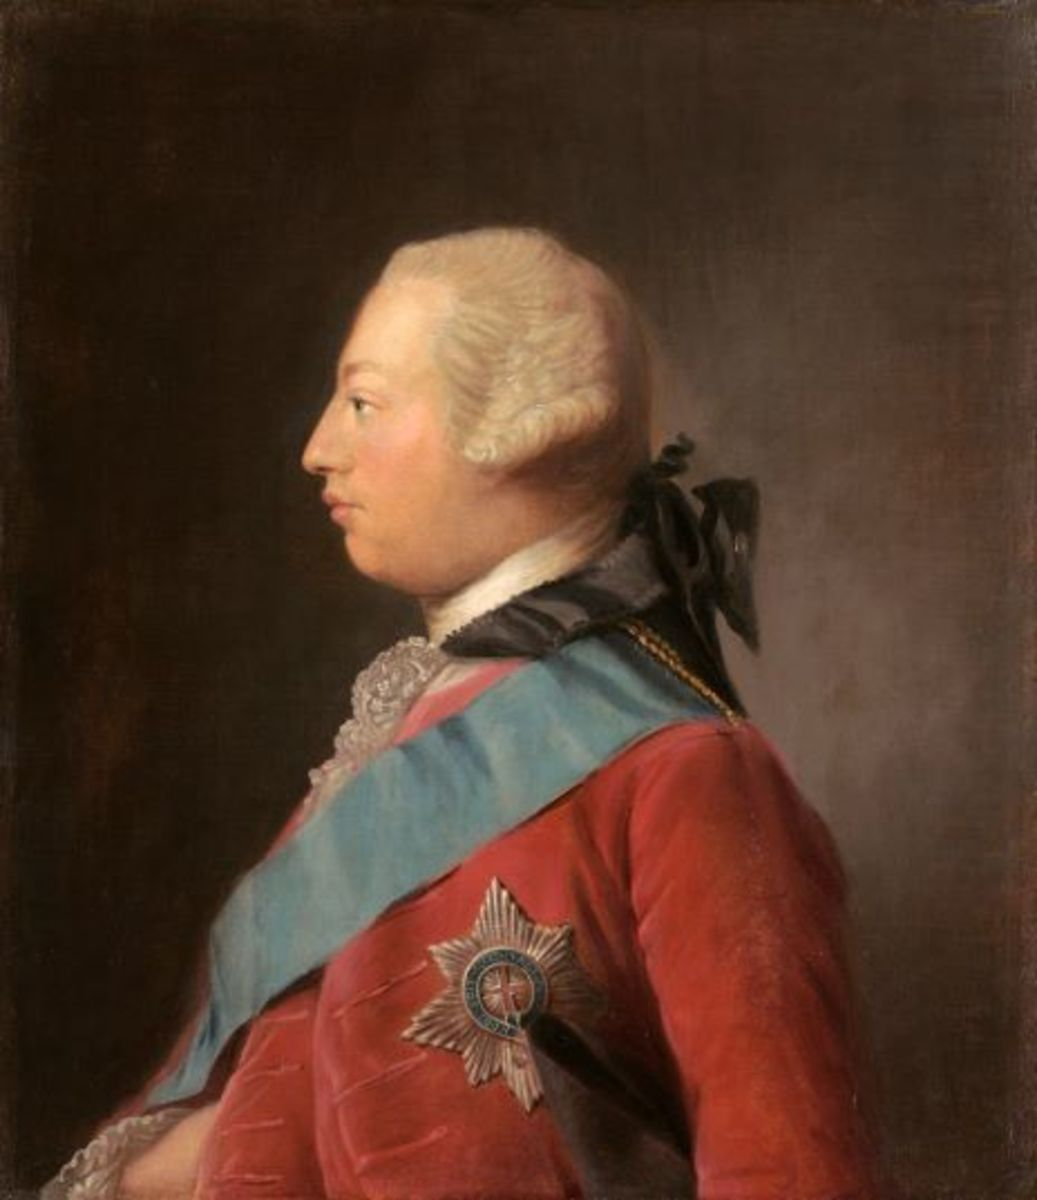 George III's Illness and Misdiagnosis